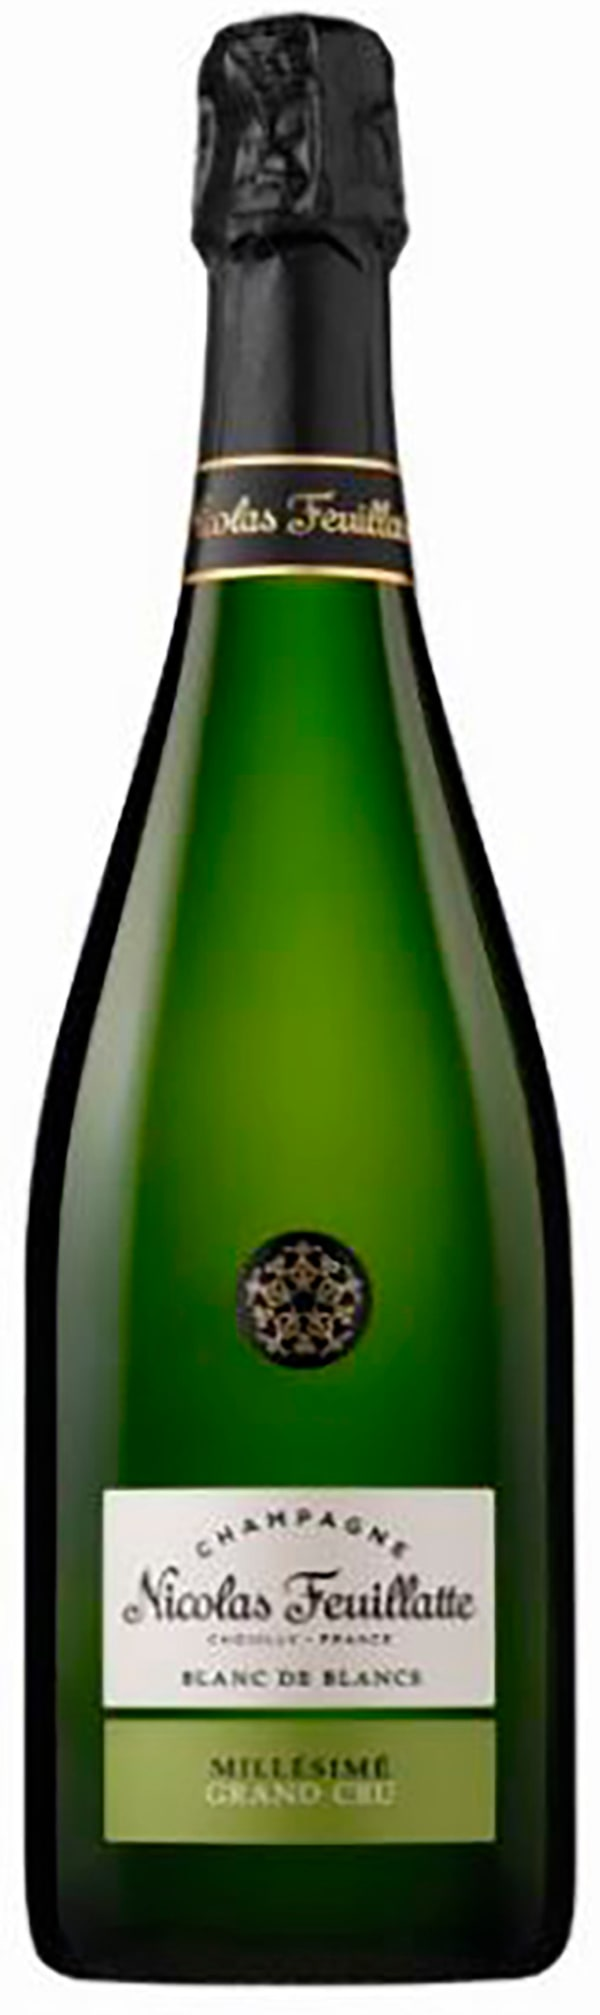 Nicolas Feuillatte Grand Cru Blanc de Blancs Champagne Brut 2012